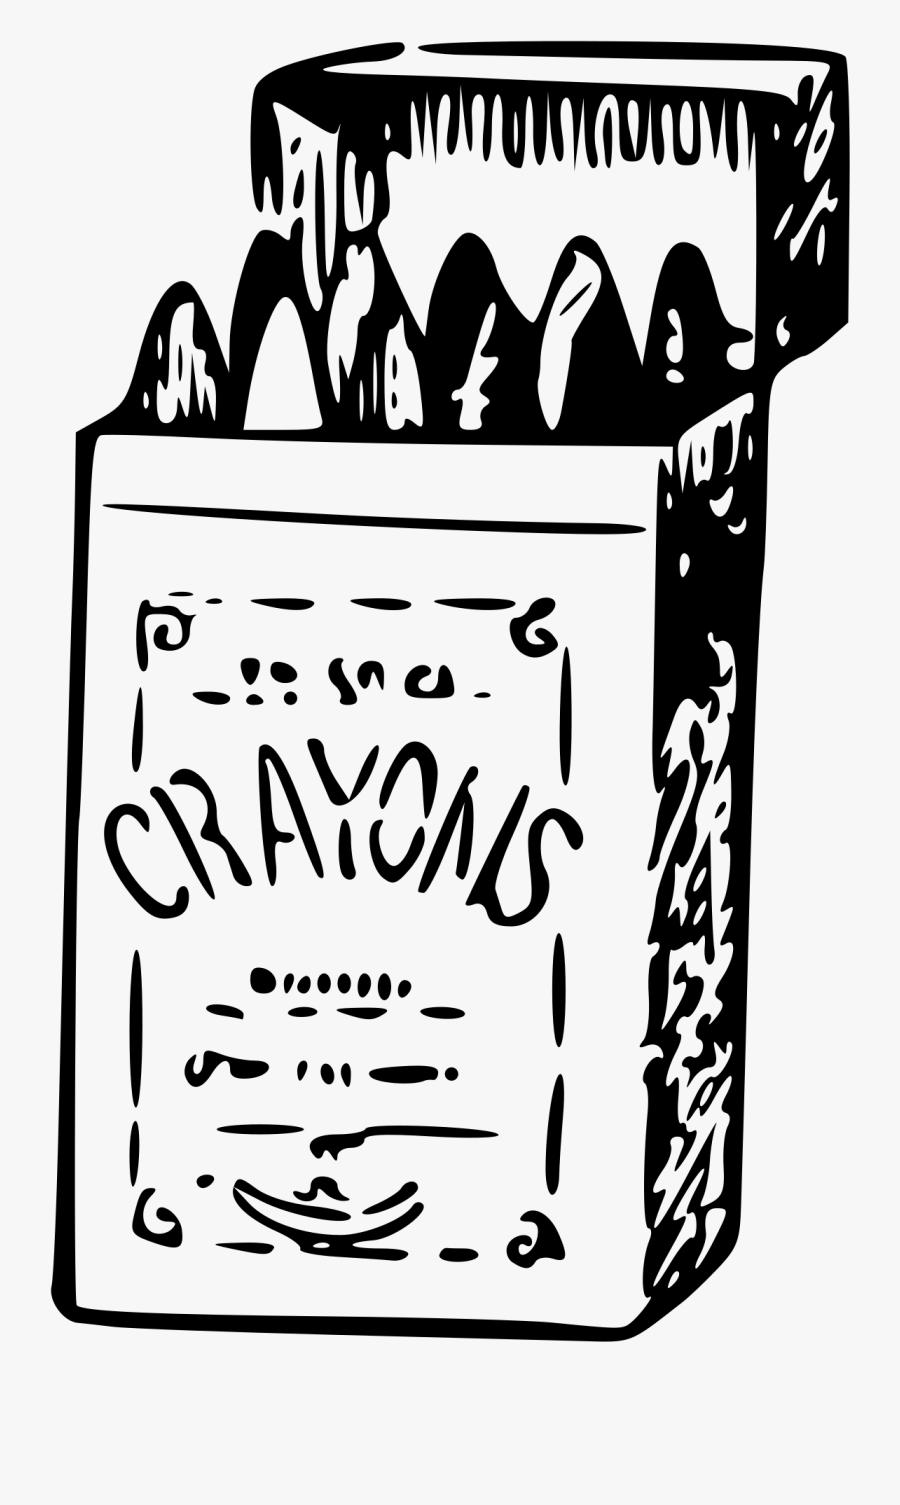 Crayons Clip Arts - Sketch Crayons, Transparent Clipart